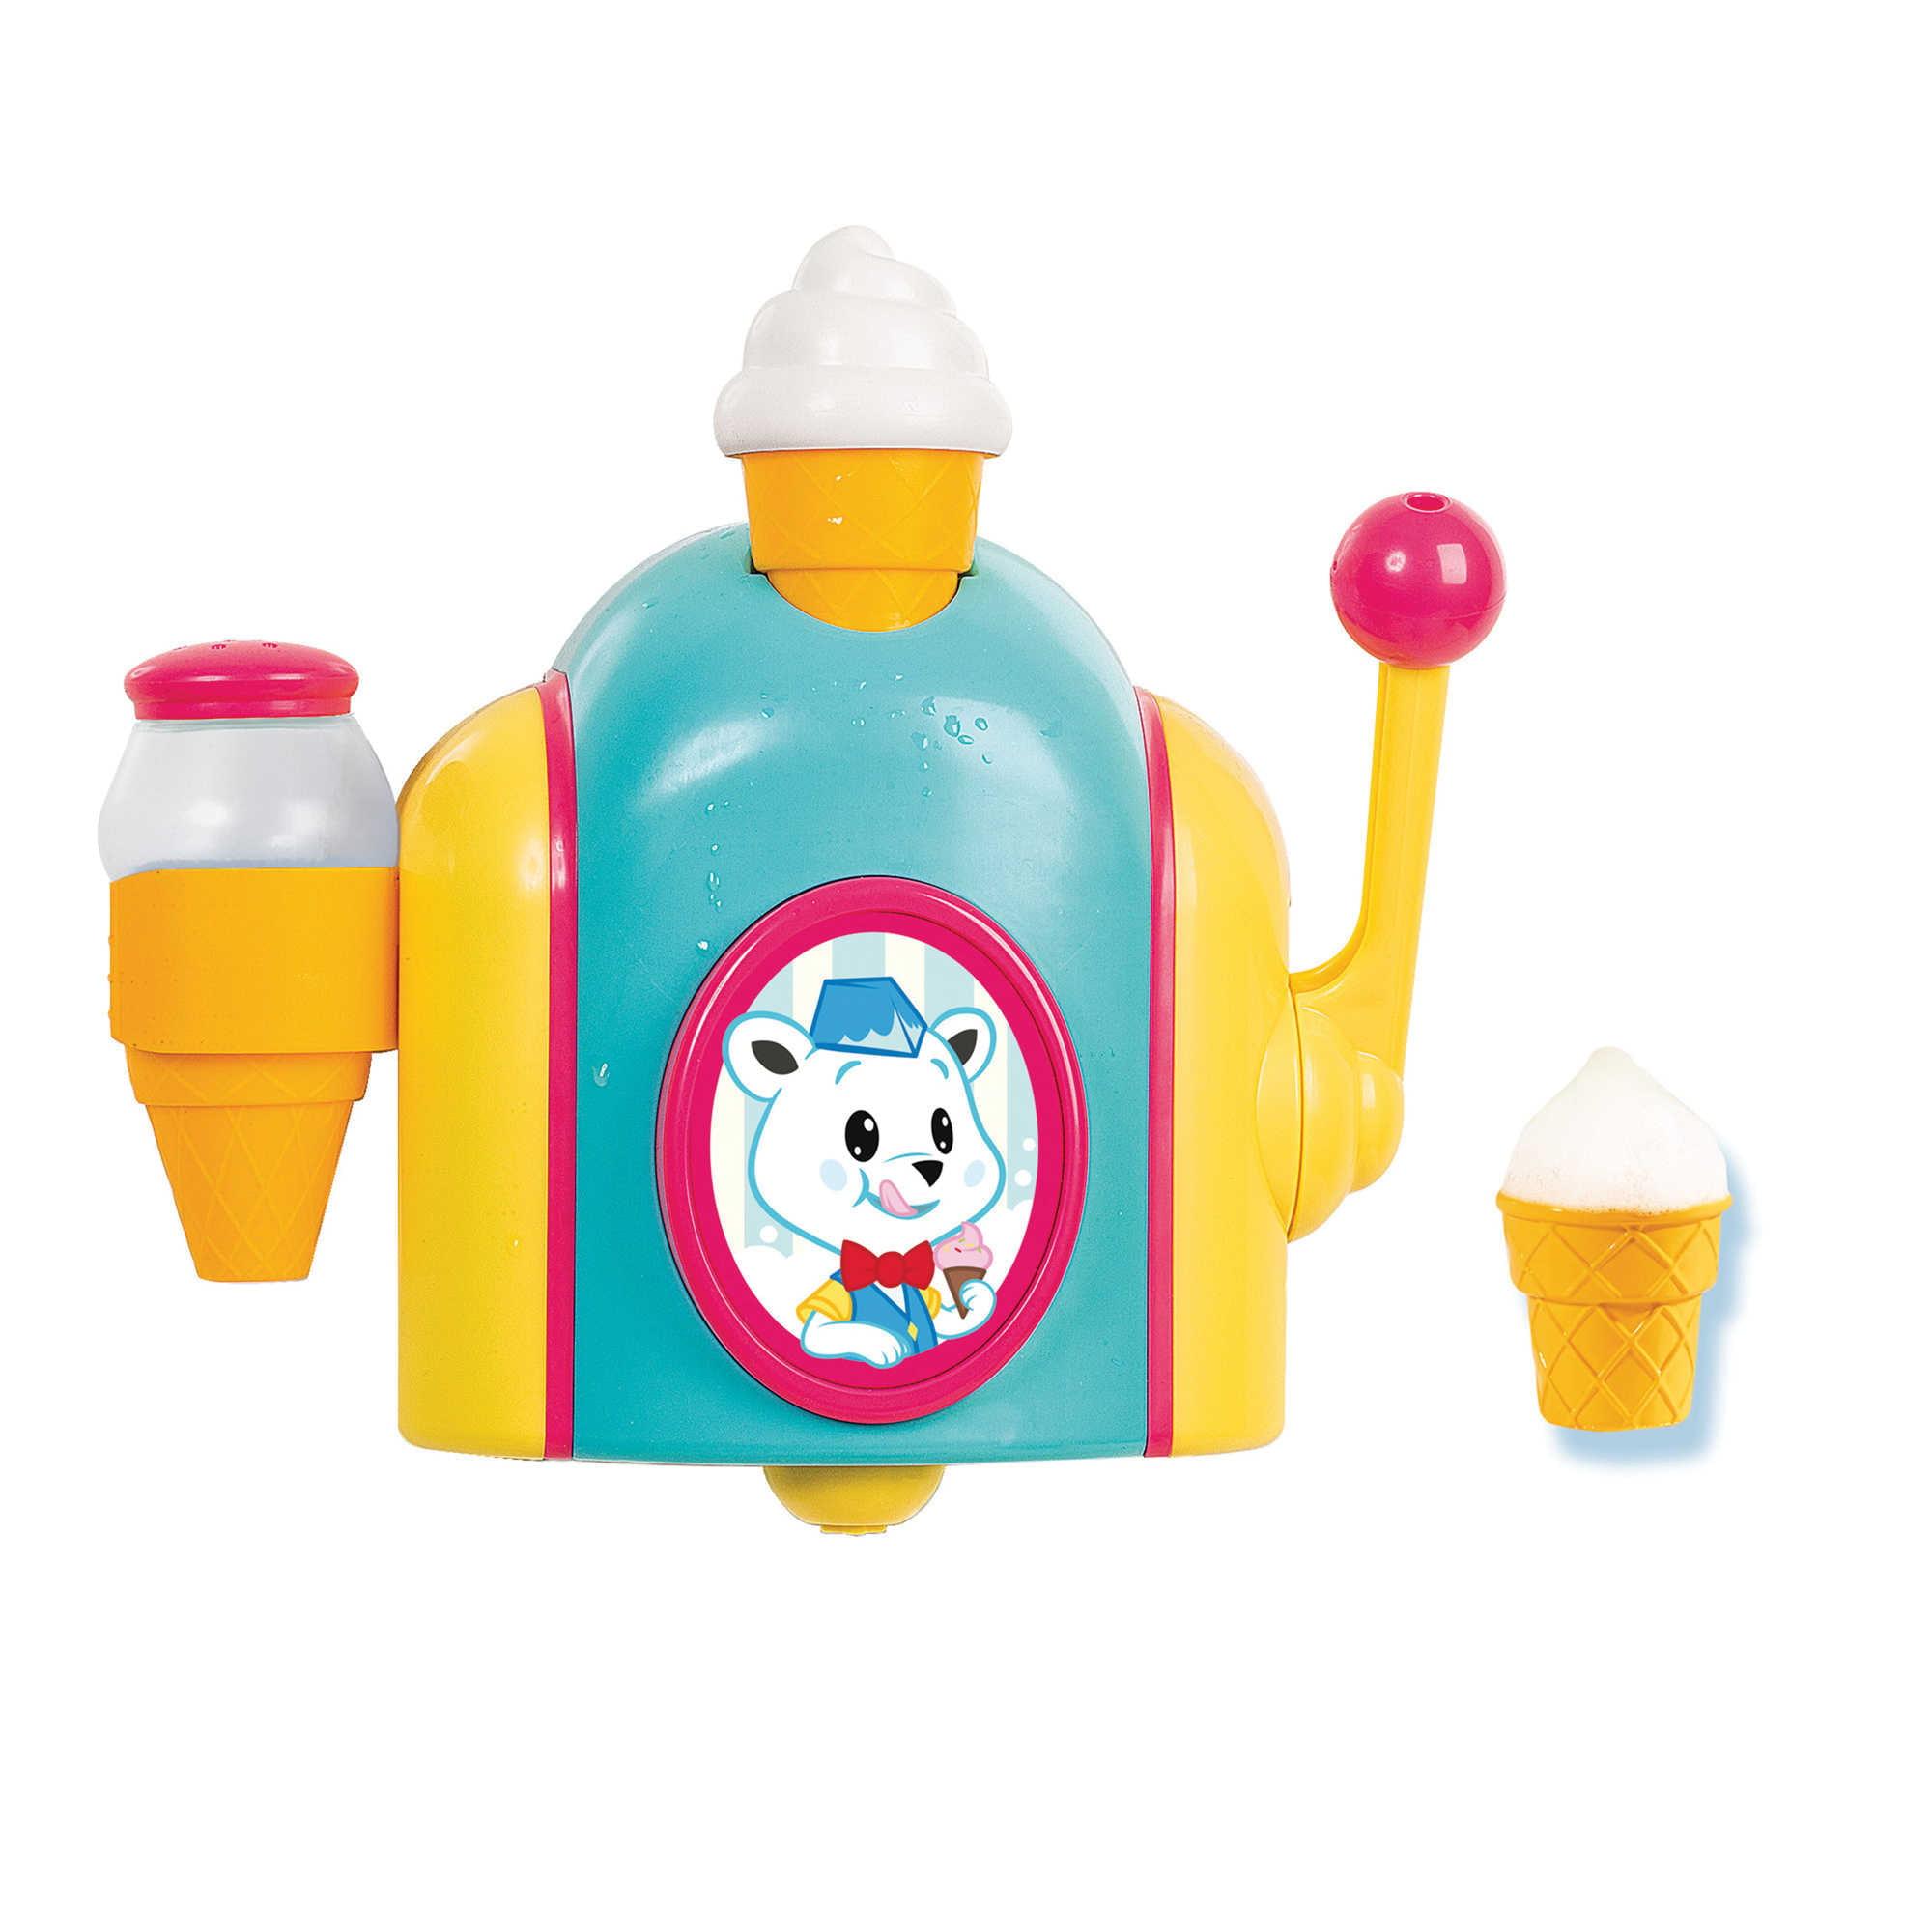 Tomy Toomies Foam Cone Factory, Toddler Bath Toy, 18m+ by TOMY TOOMIES